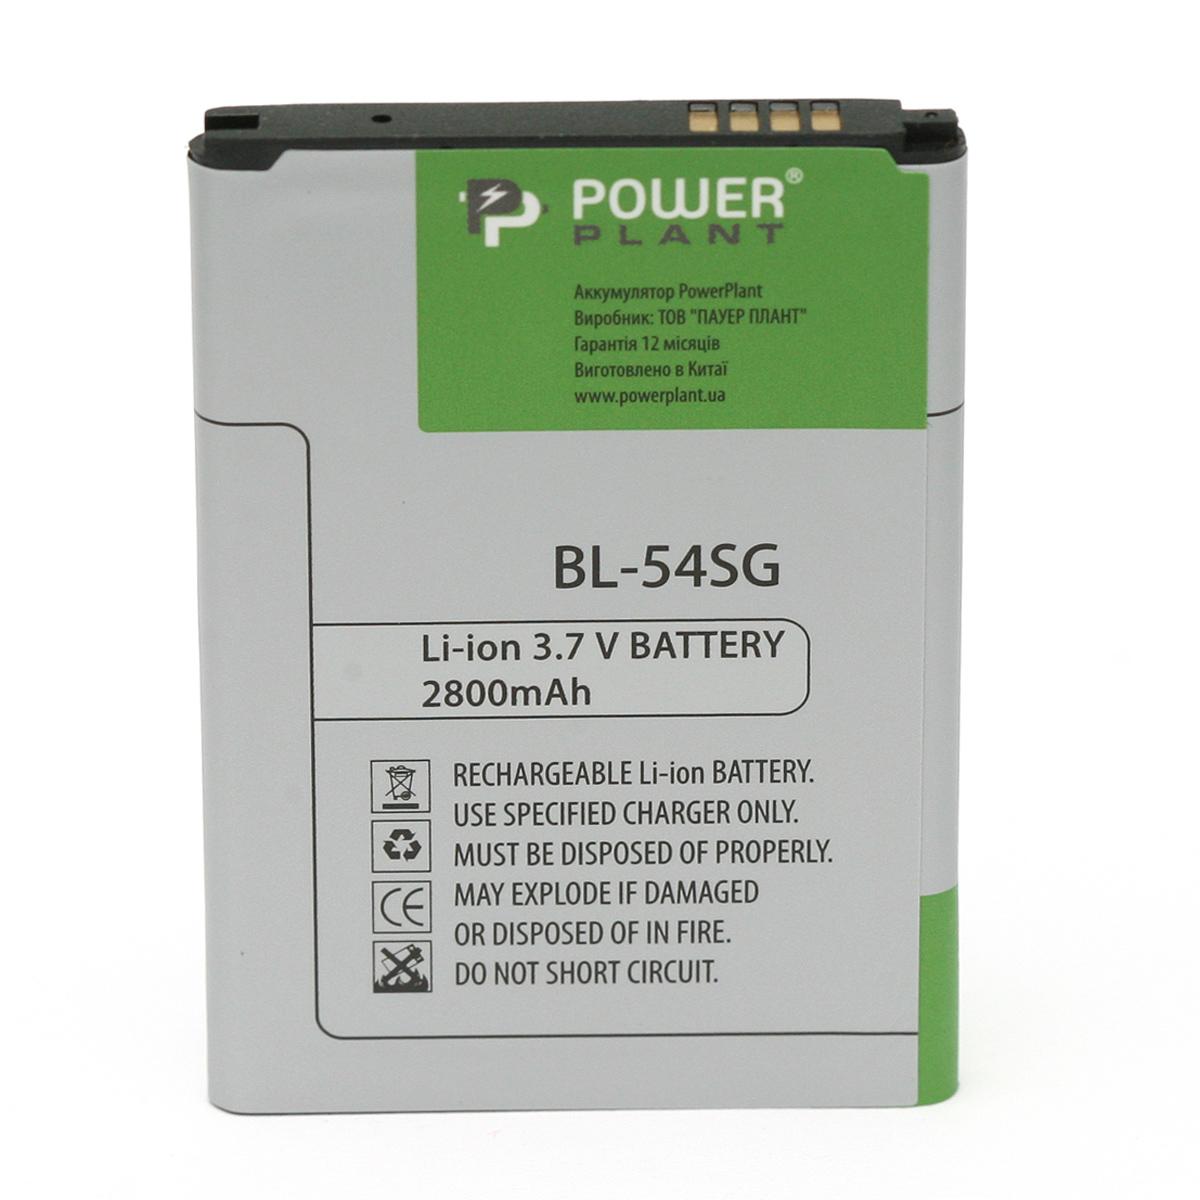 Купить Аккумулятор PowerPlant LG G2 (BL-54SG) 2800mAh